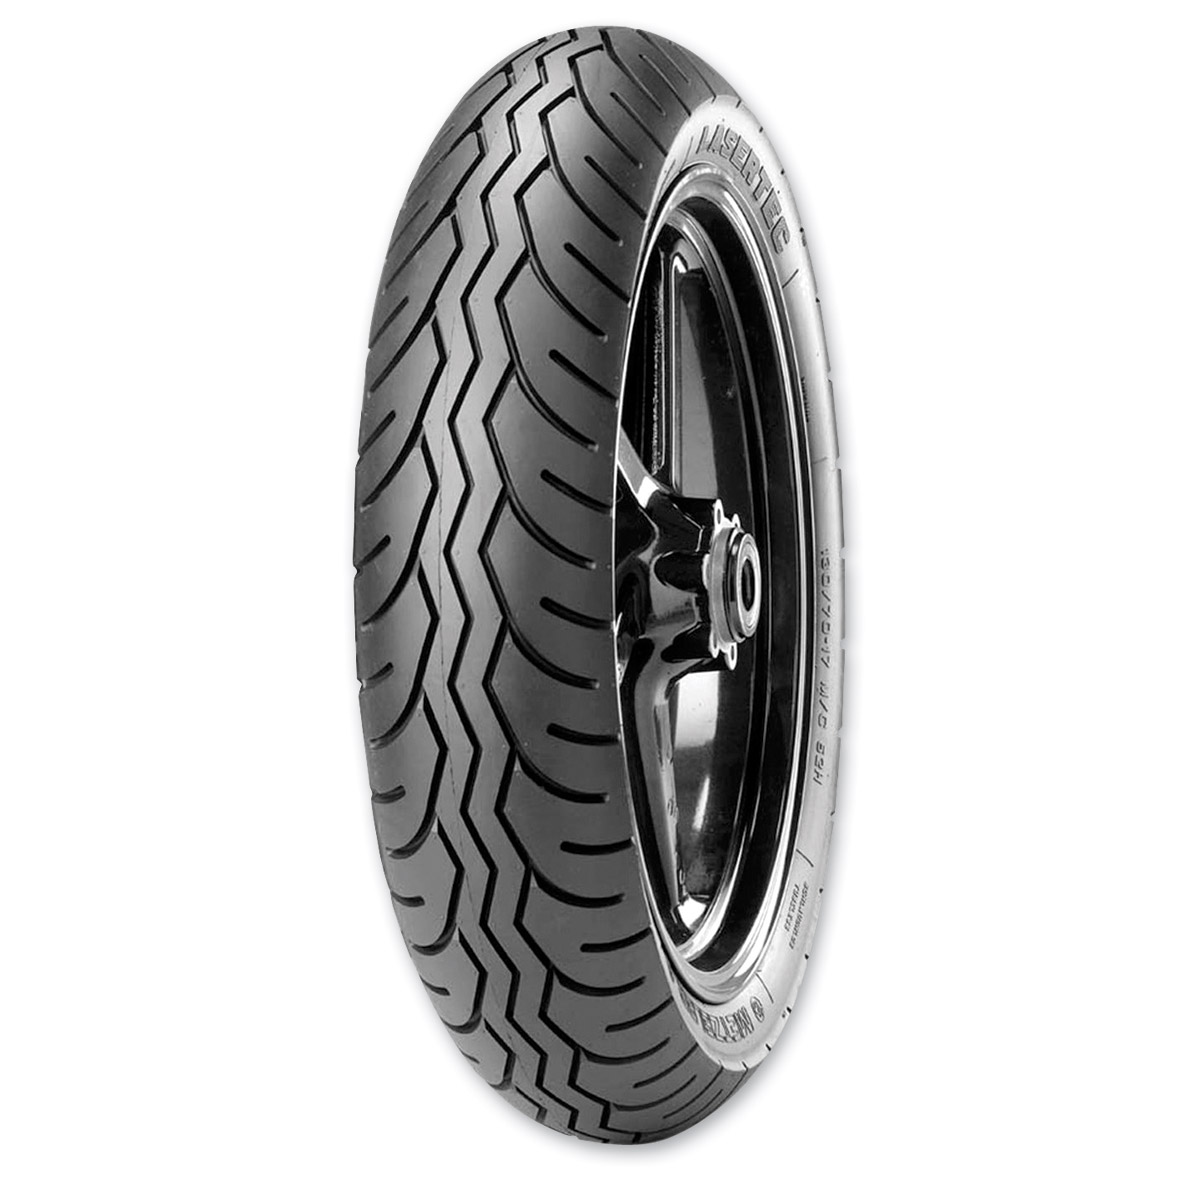 Metzeler Lasertec 130/70-17 Rear Tire